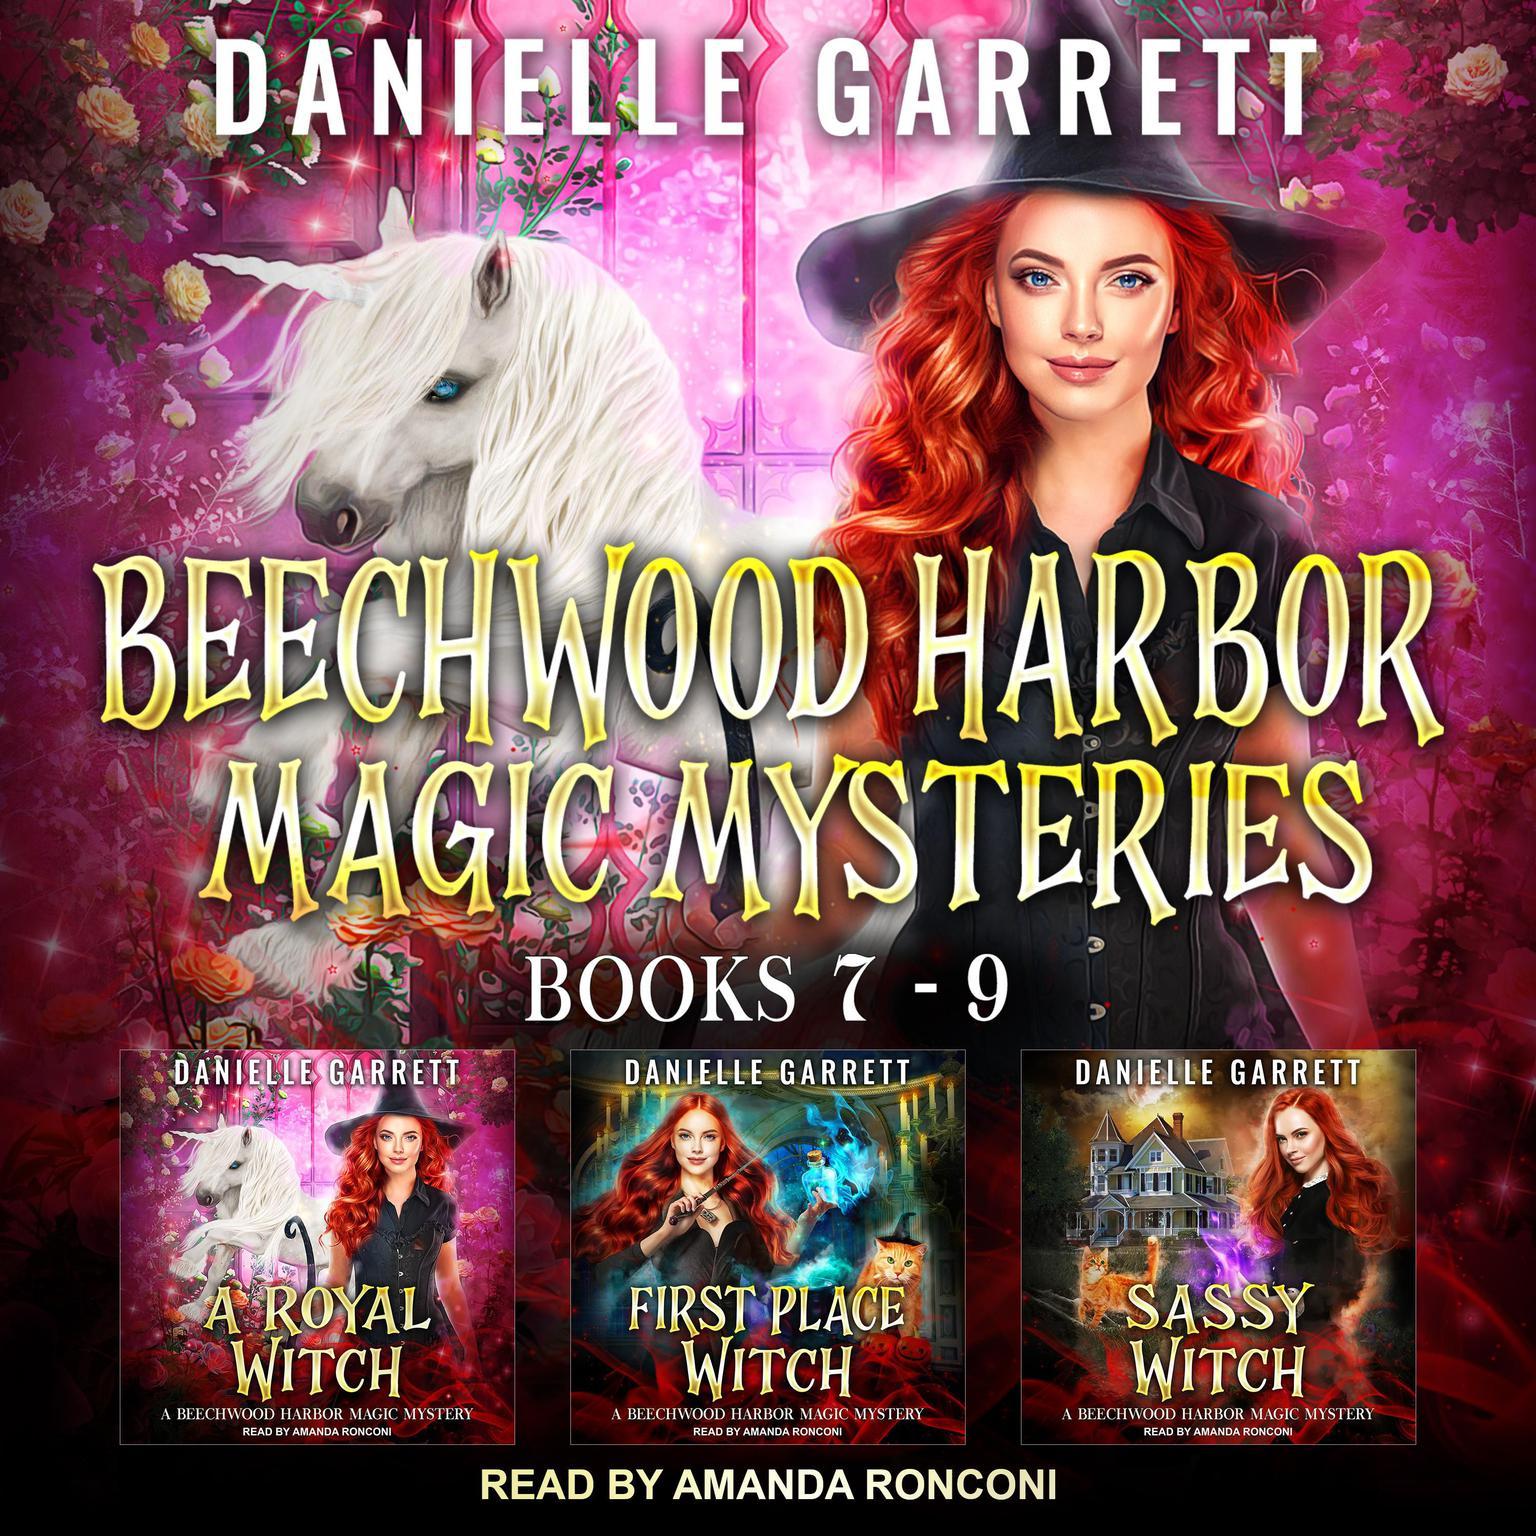 The Beechwood Harbor Magic Mysteries Boxed Set: Books 7-9 Audiobook, by Danielle Garrett